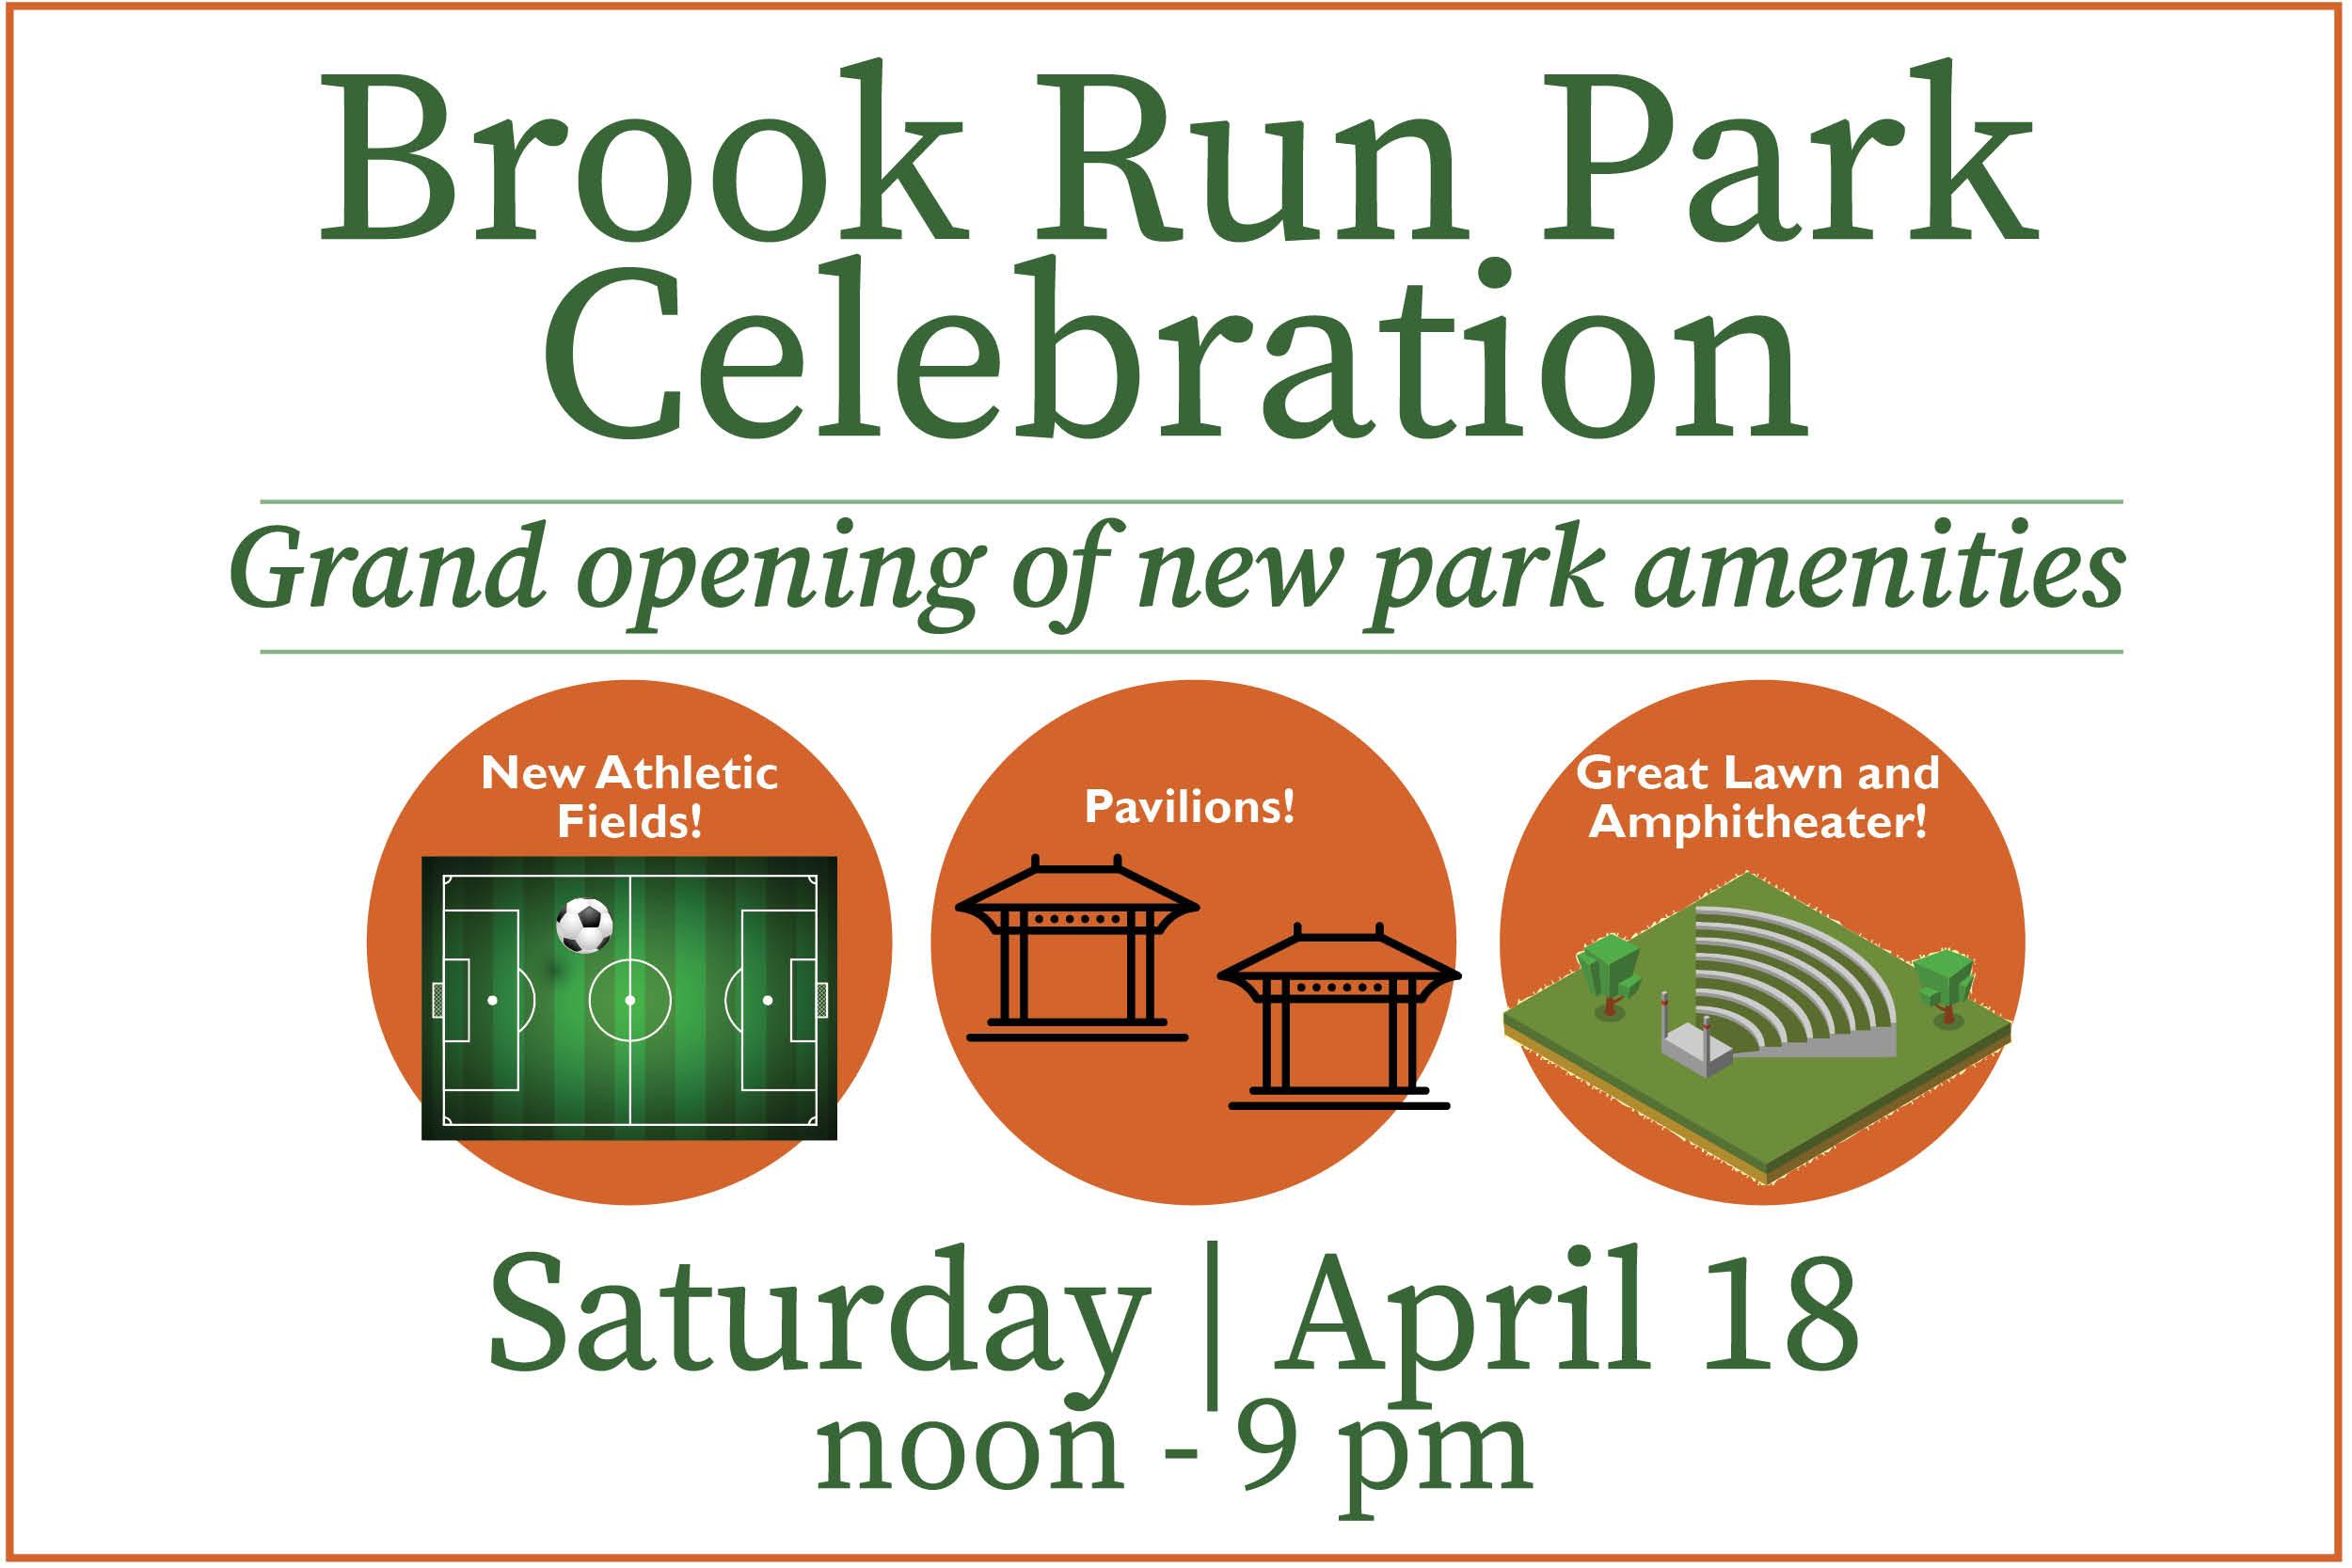 Brook Run Park Celebration